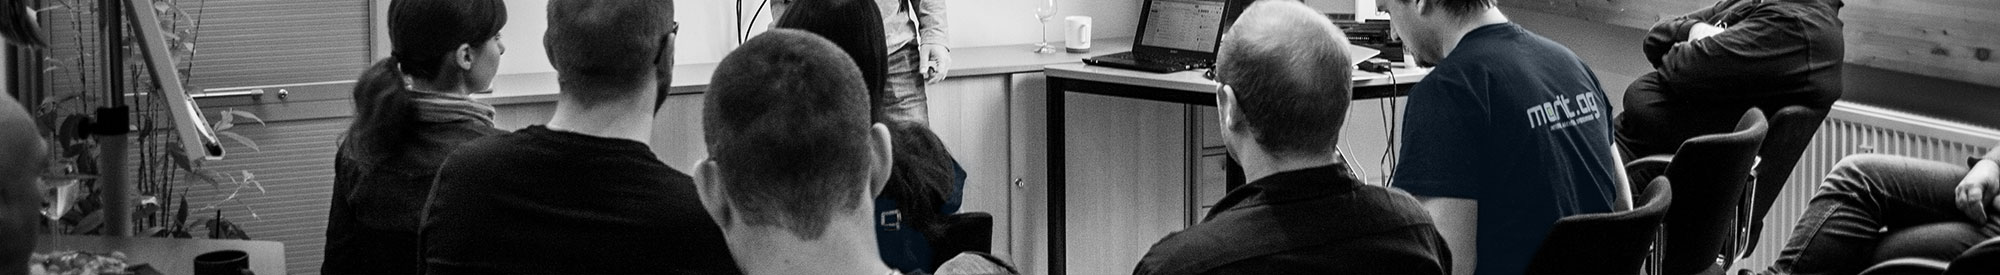 Internetagentur Marit AG München Partner